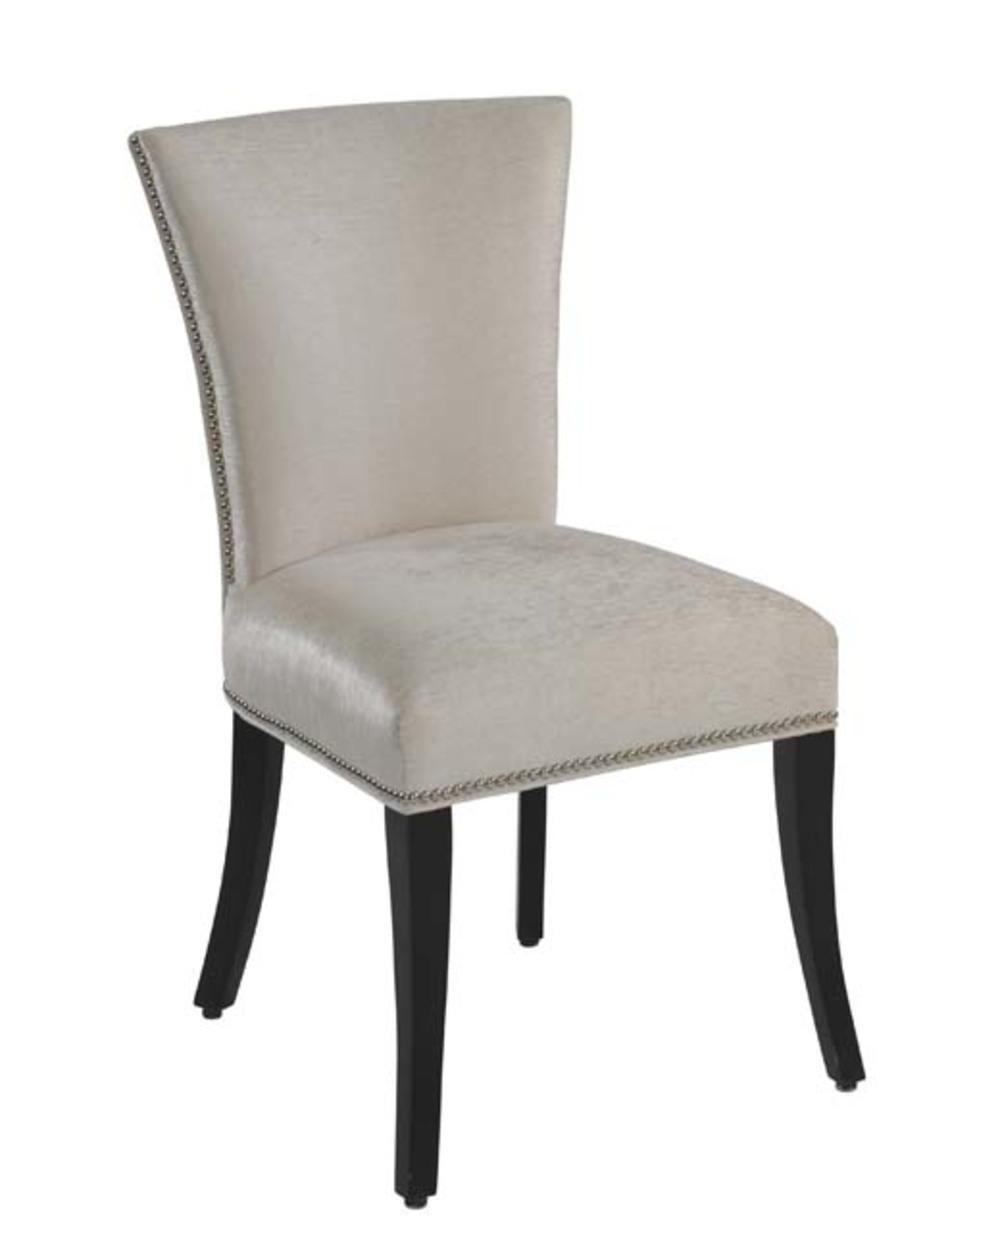 Designmaster Furniture - Danbury Studio Chair